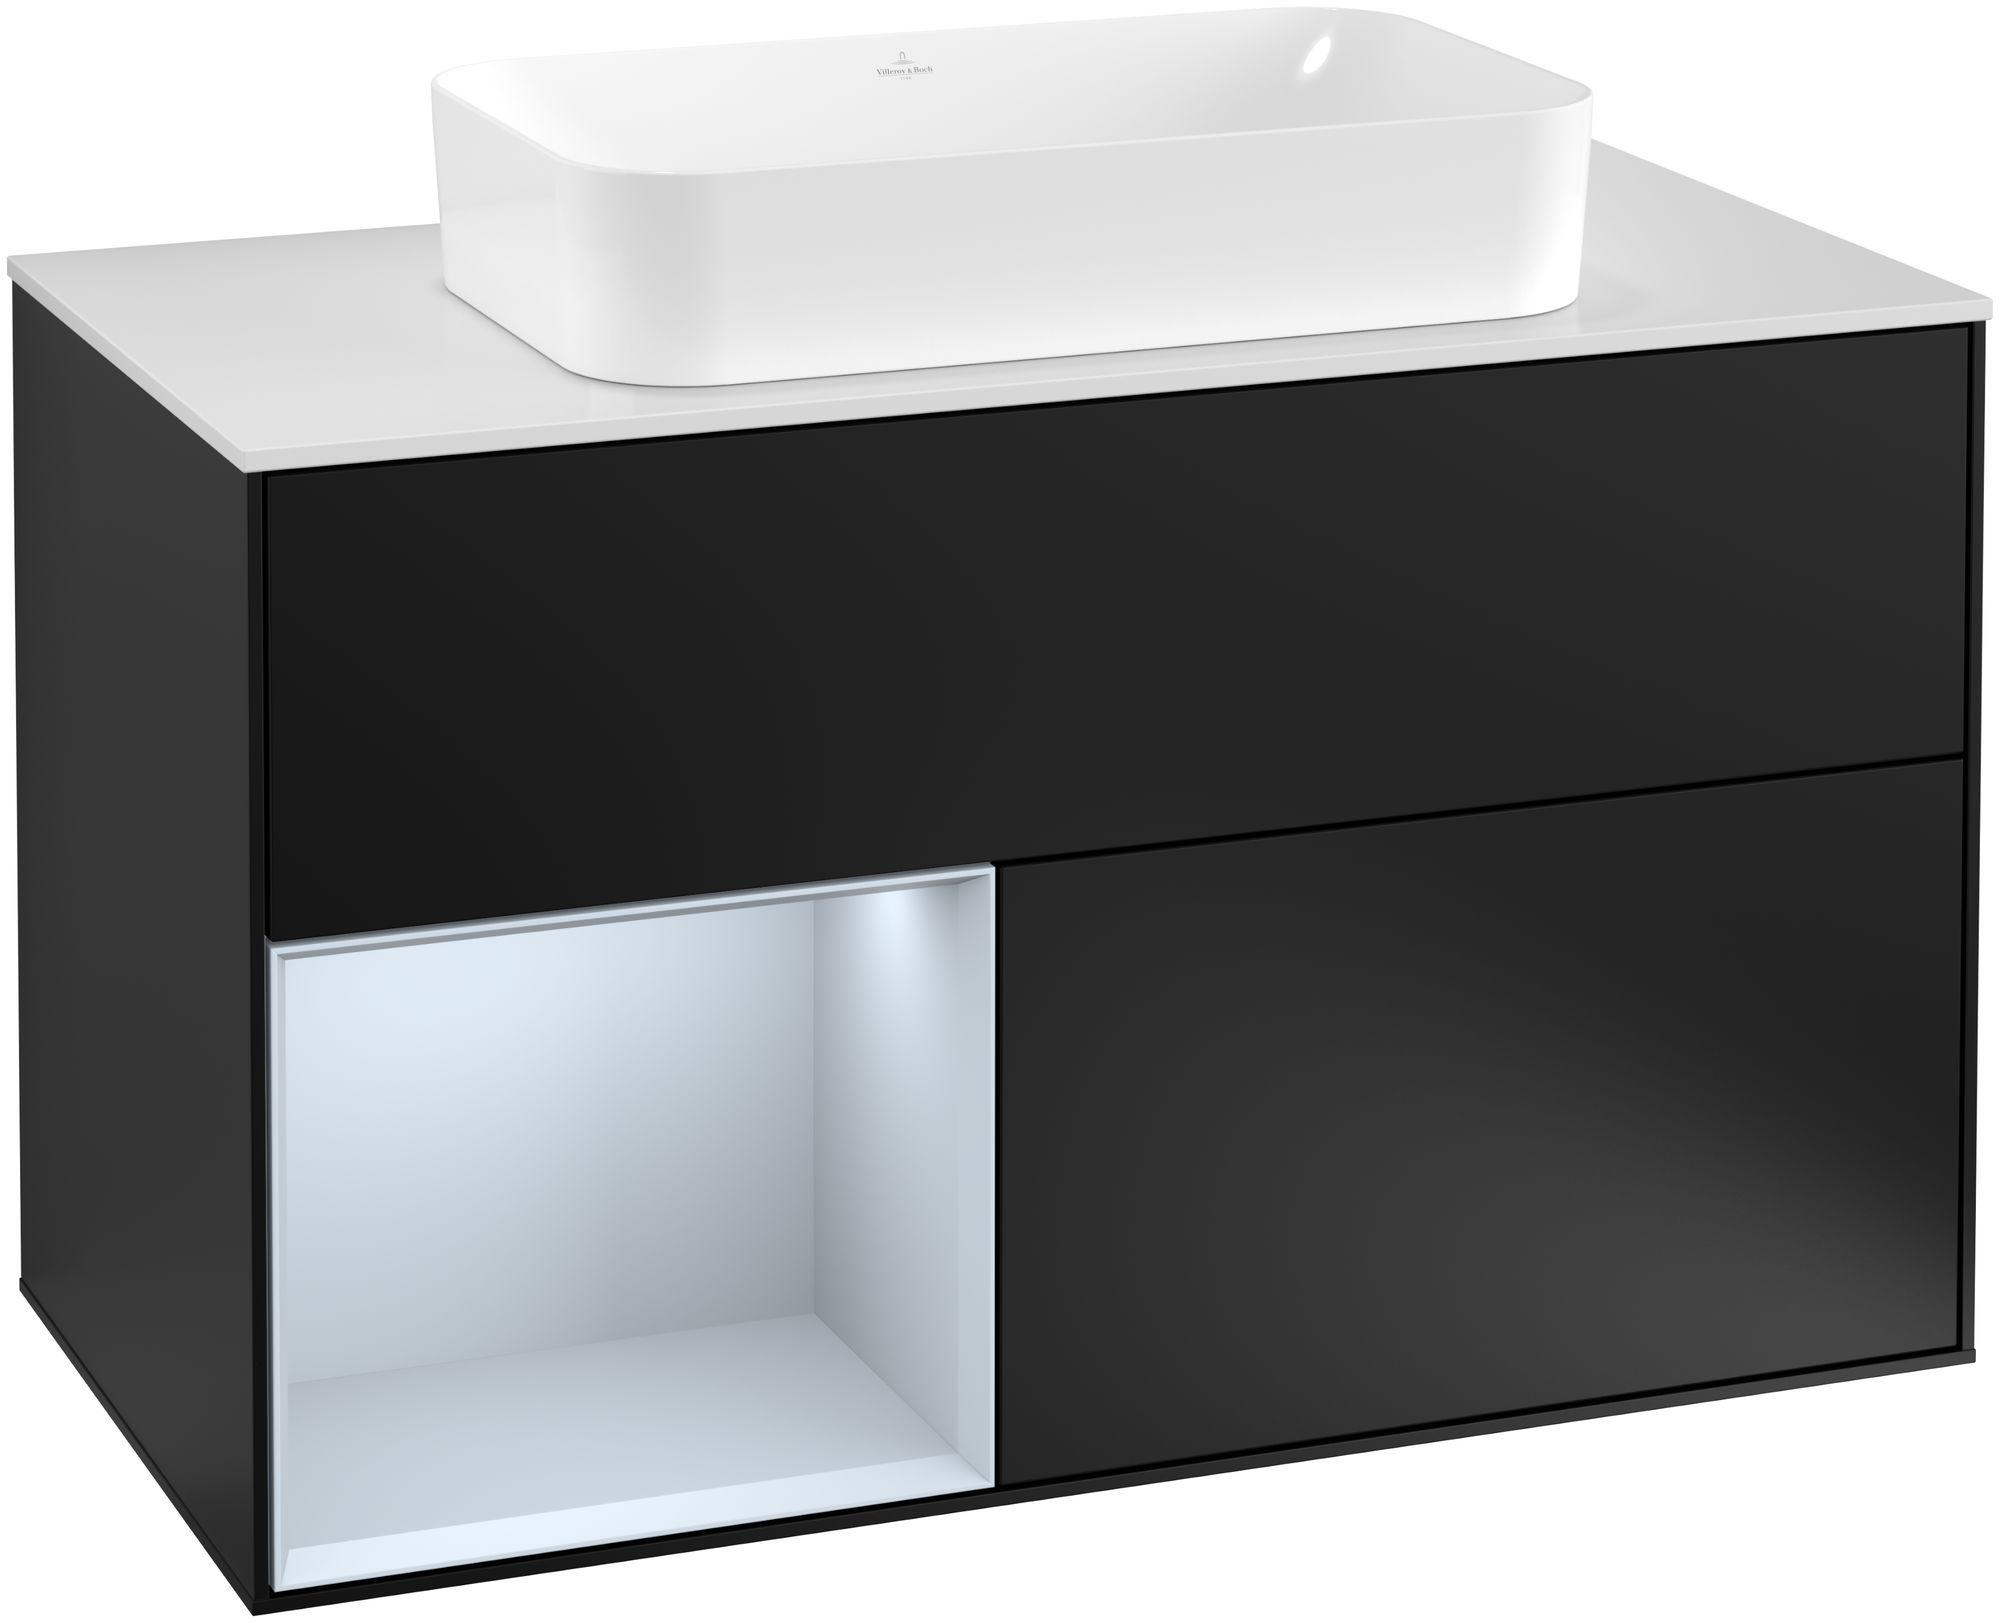 Villeroy & Boch Finion G24 Waschtischunterschrank mit Regalelement 2 Auszüge Waschtisch mittig LED-Beleuchtung B:100xH:60,3xT:50,1cm Front, Korpus: Black Matt Lacquer, Regal: Cloud, Glasplatte: White Matt G241HAPD